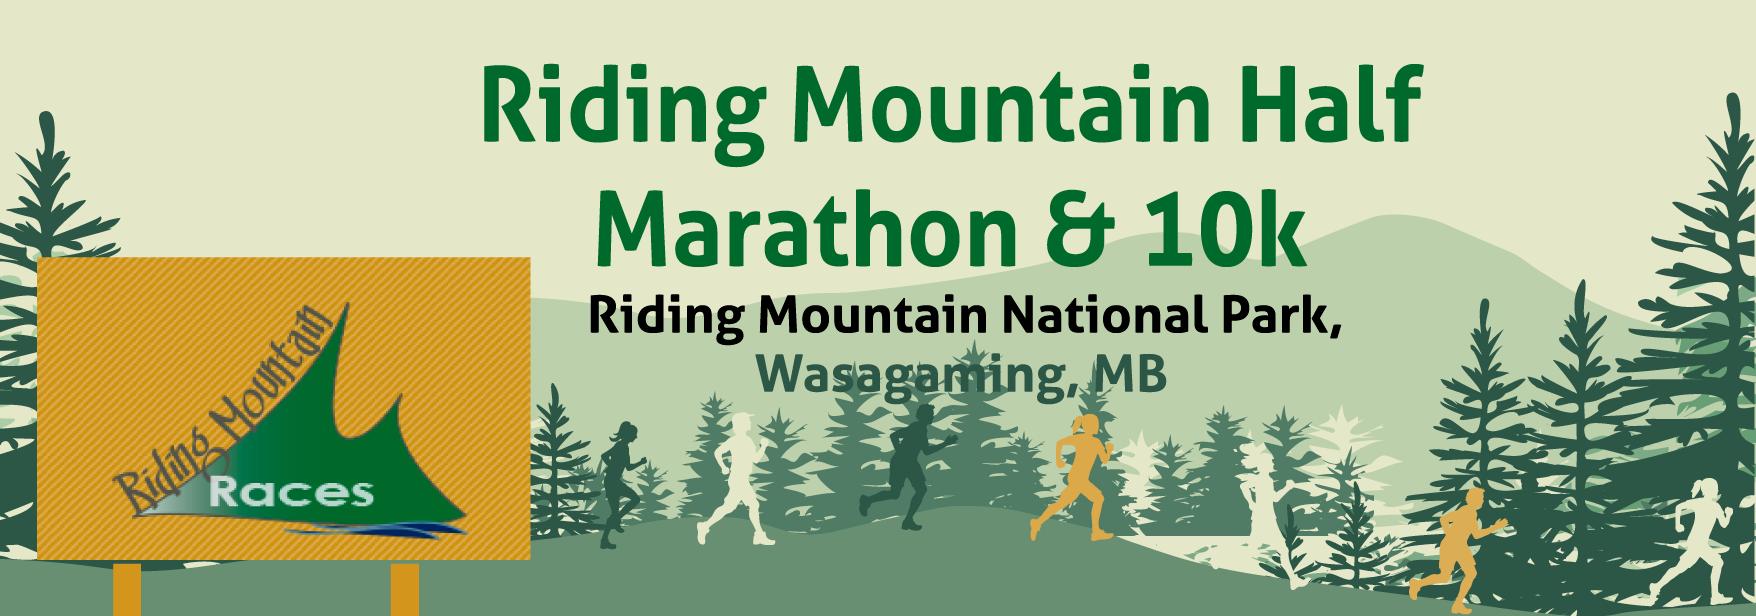 manitoba-runners-association-riding-mountainb